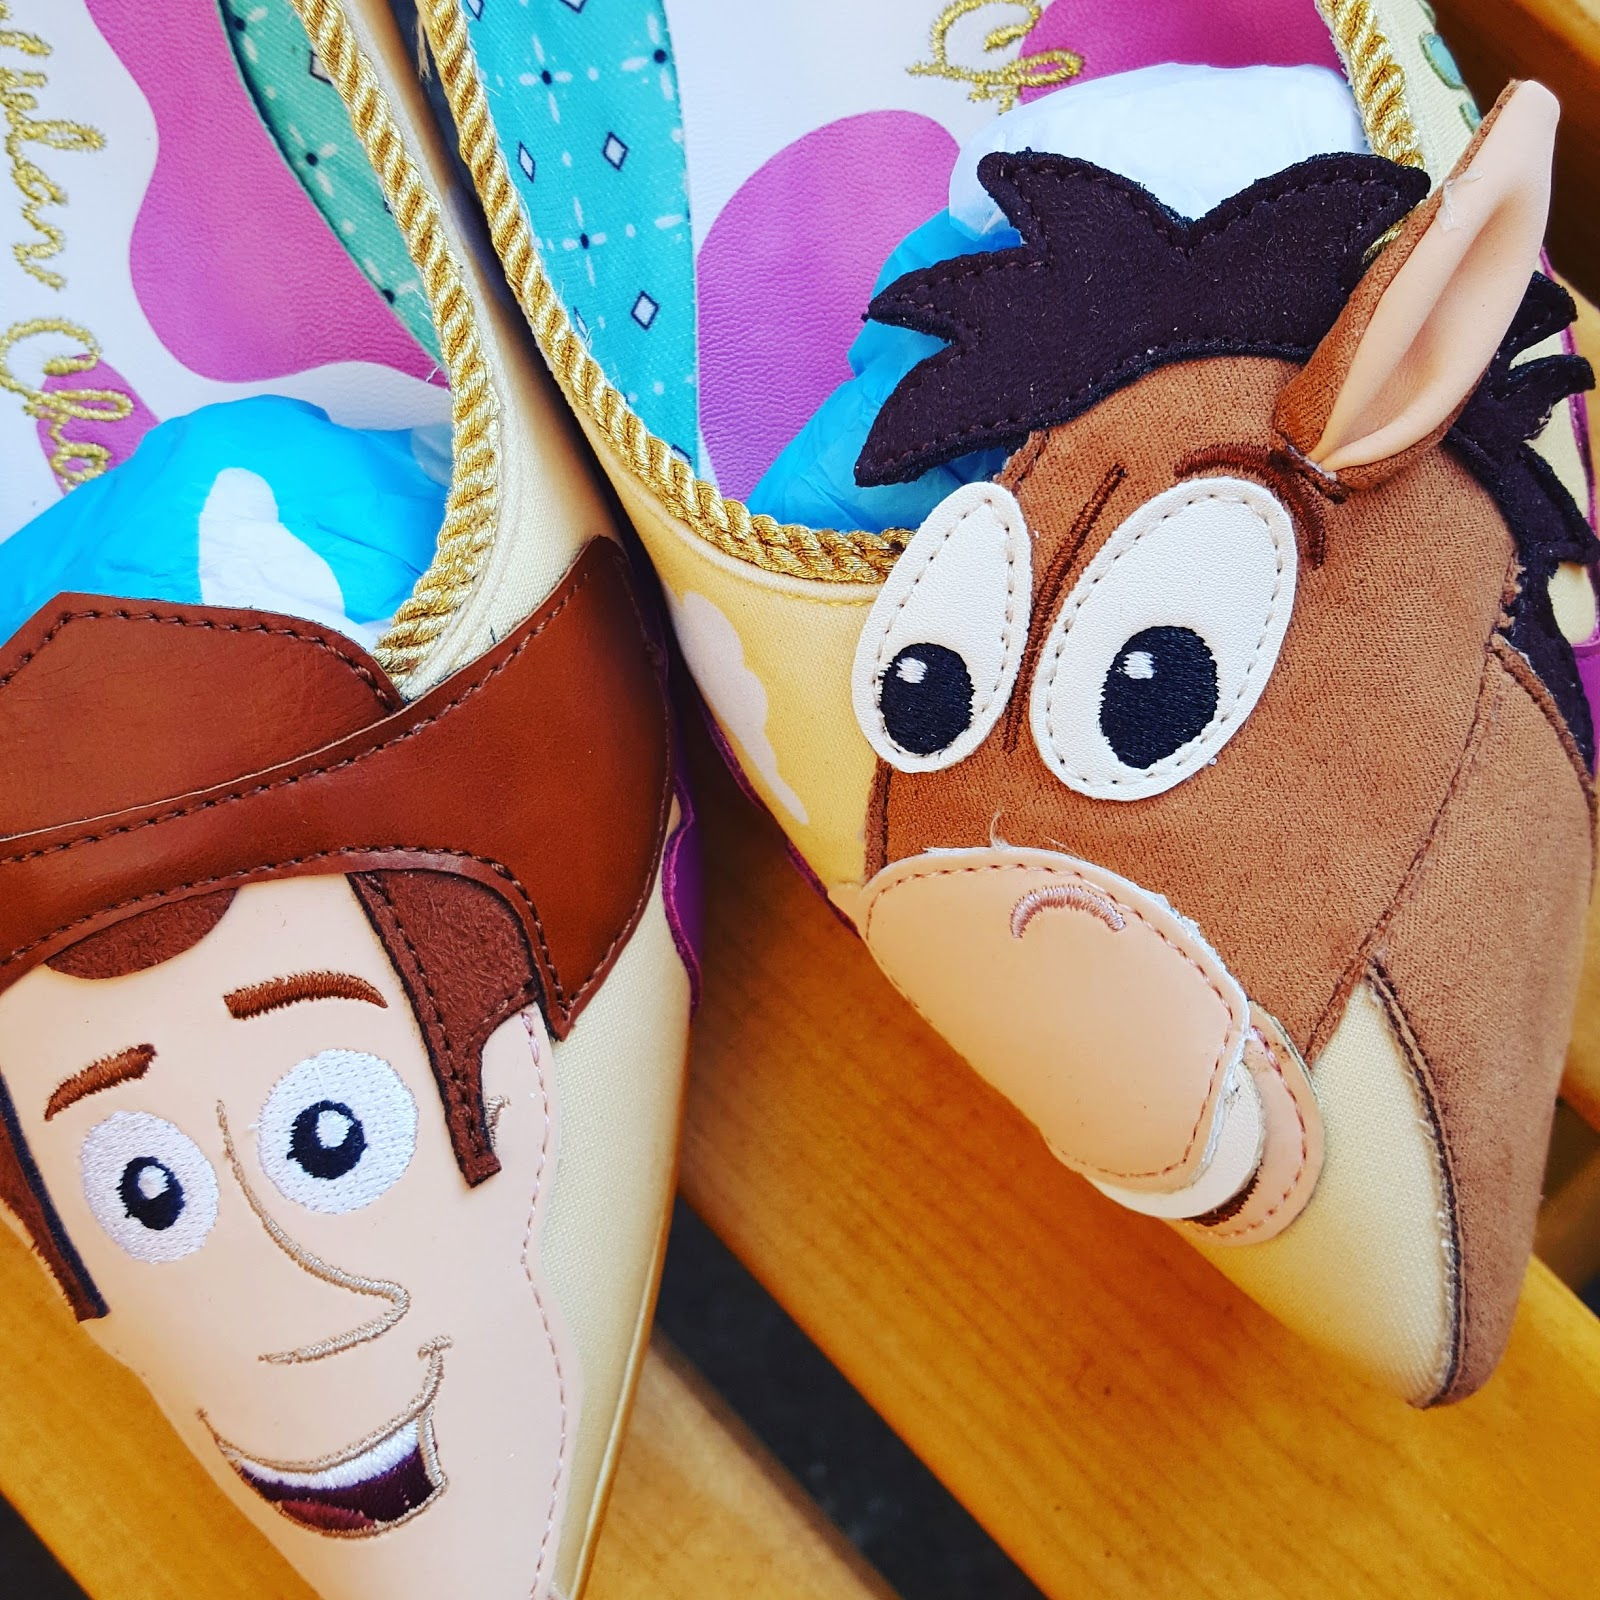 Toy Story Irregular Choice Shoes